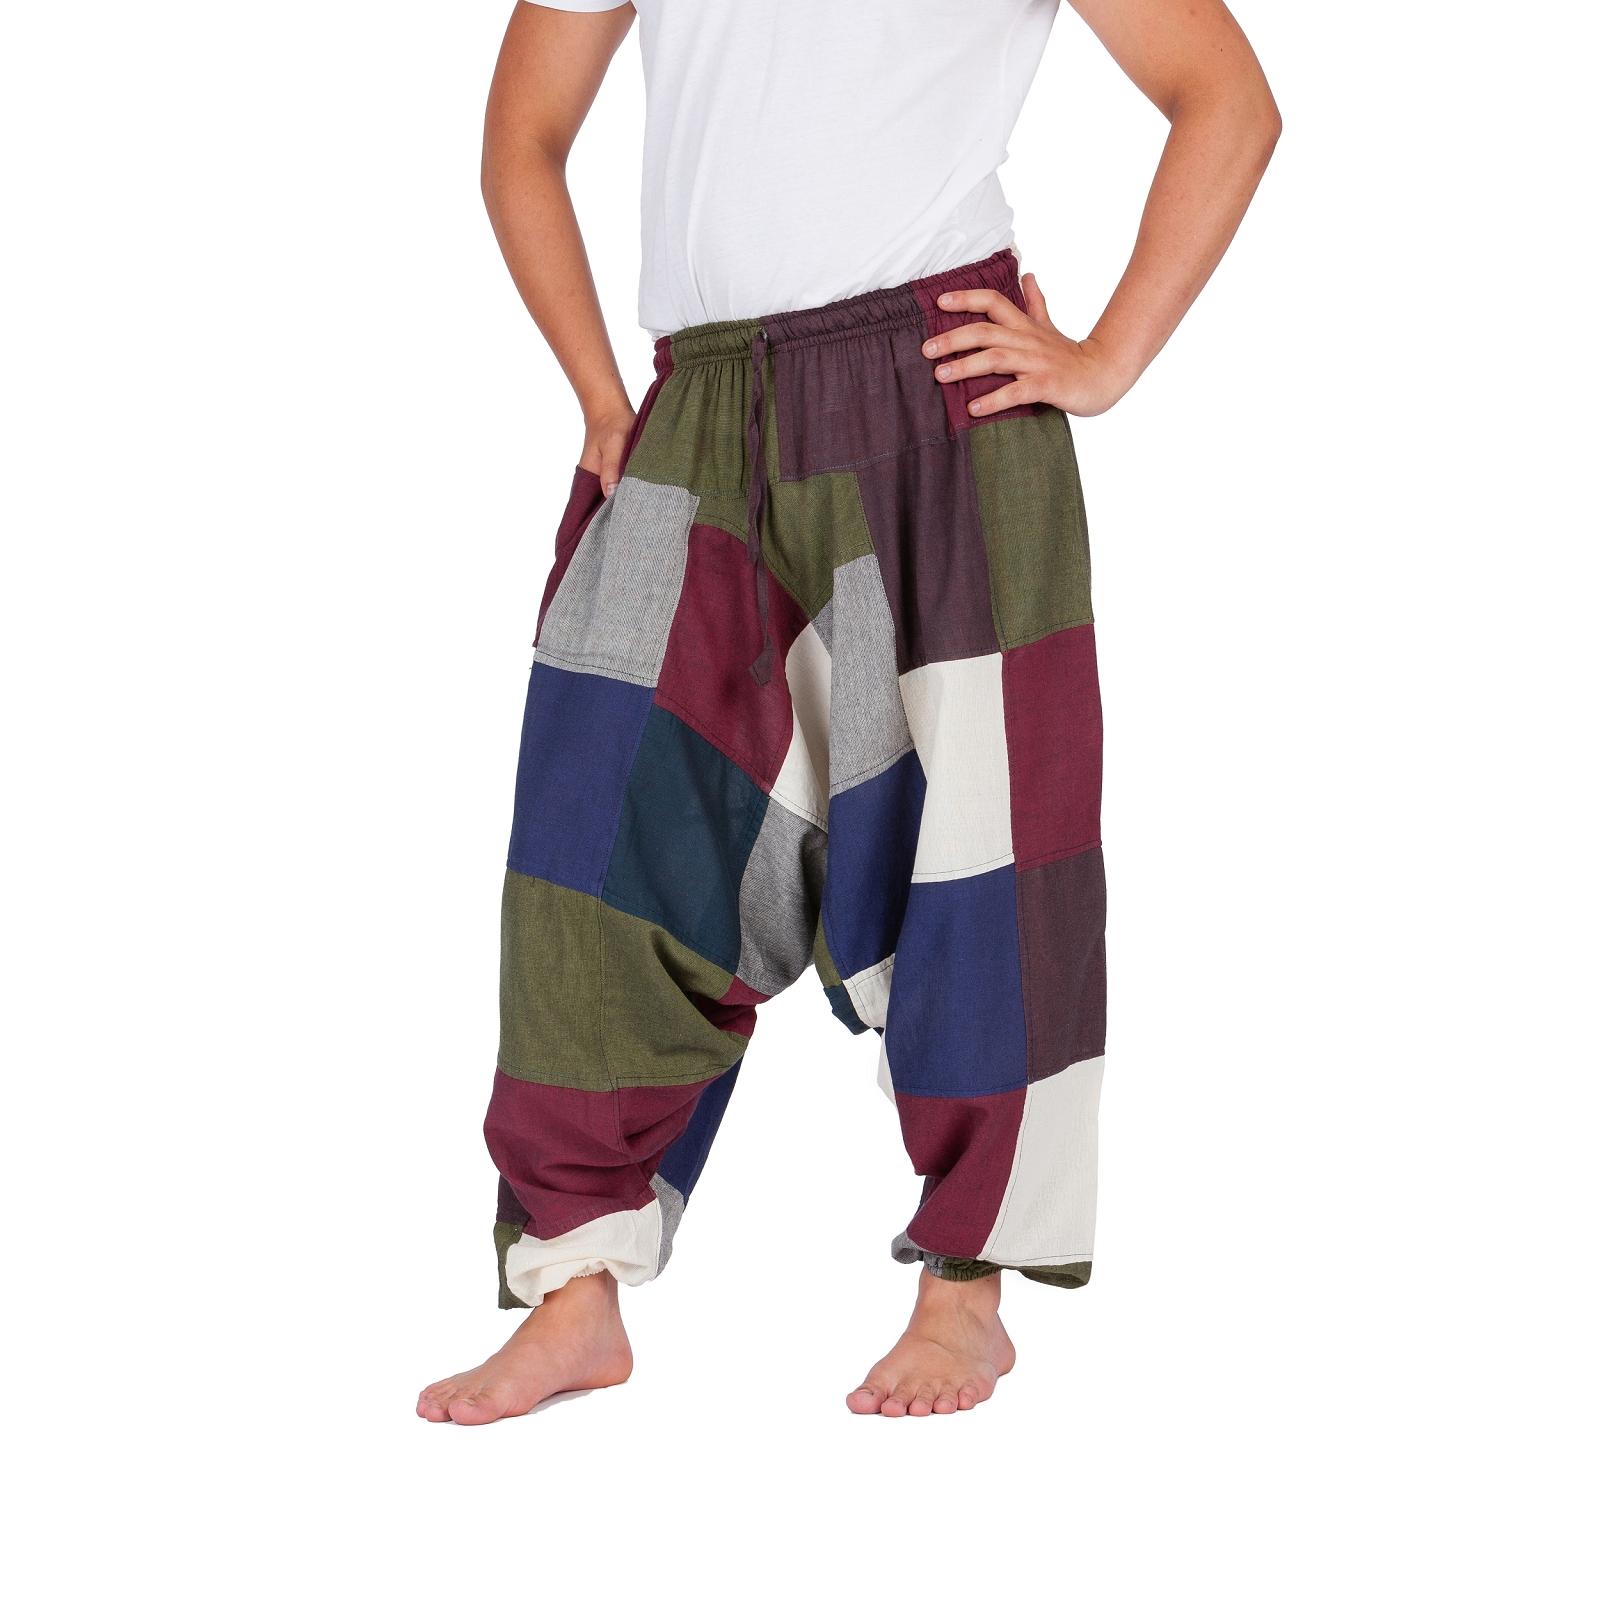 Nepal Shop Augsburg : pumphose haremshose ballonhose aladinhose patchwork pluderhose baumwolle s xl ebay ~ Watch28wear.com Haus und Dekorationen